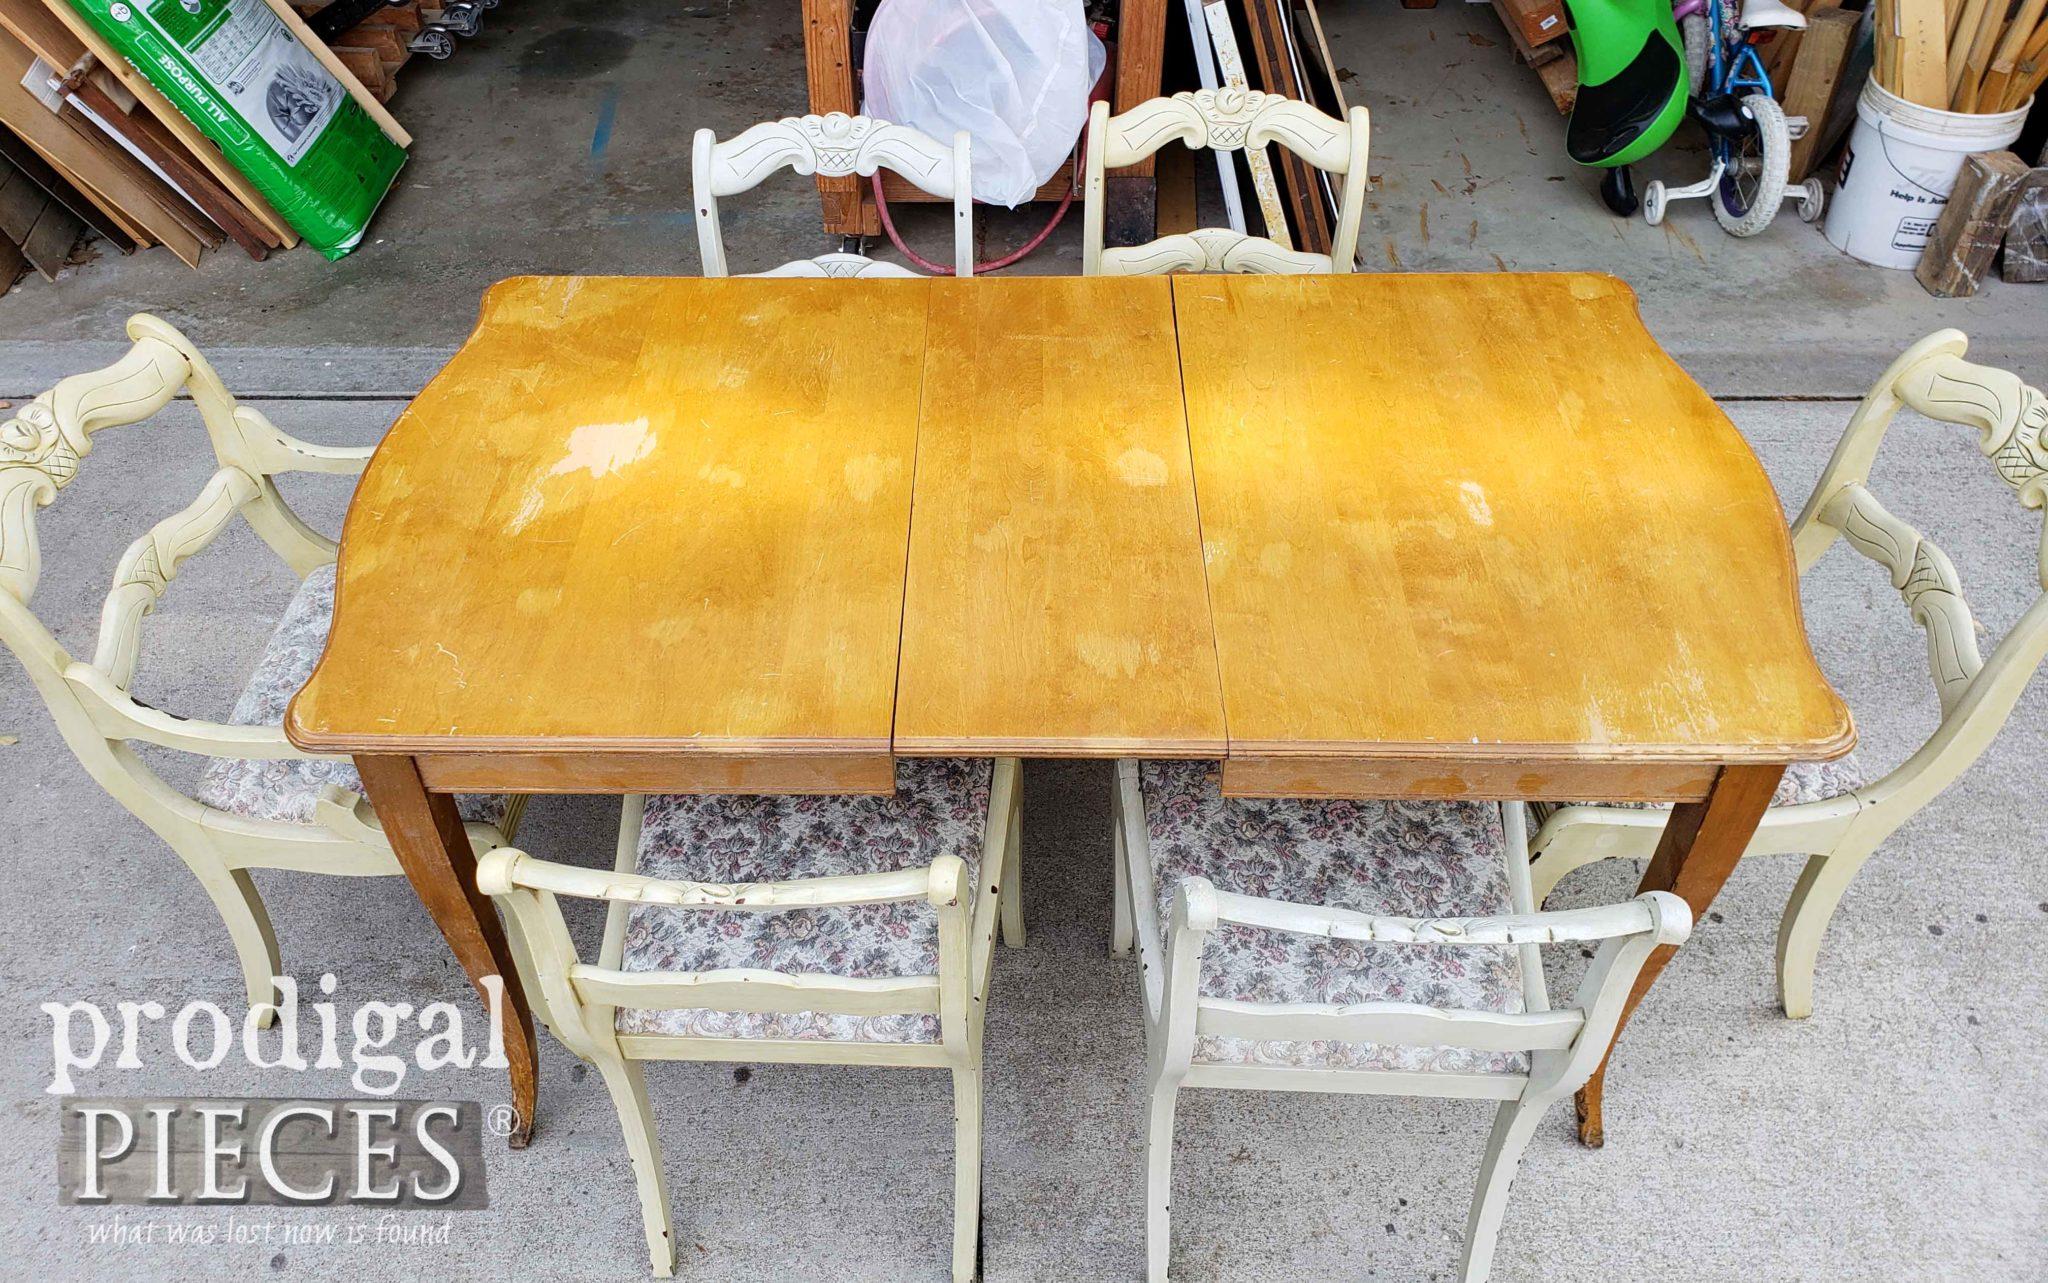 Damaged Dining Table Top | prodigalpieces.com